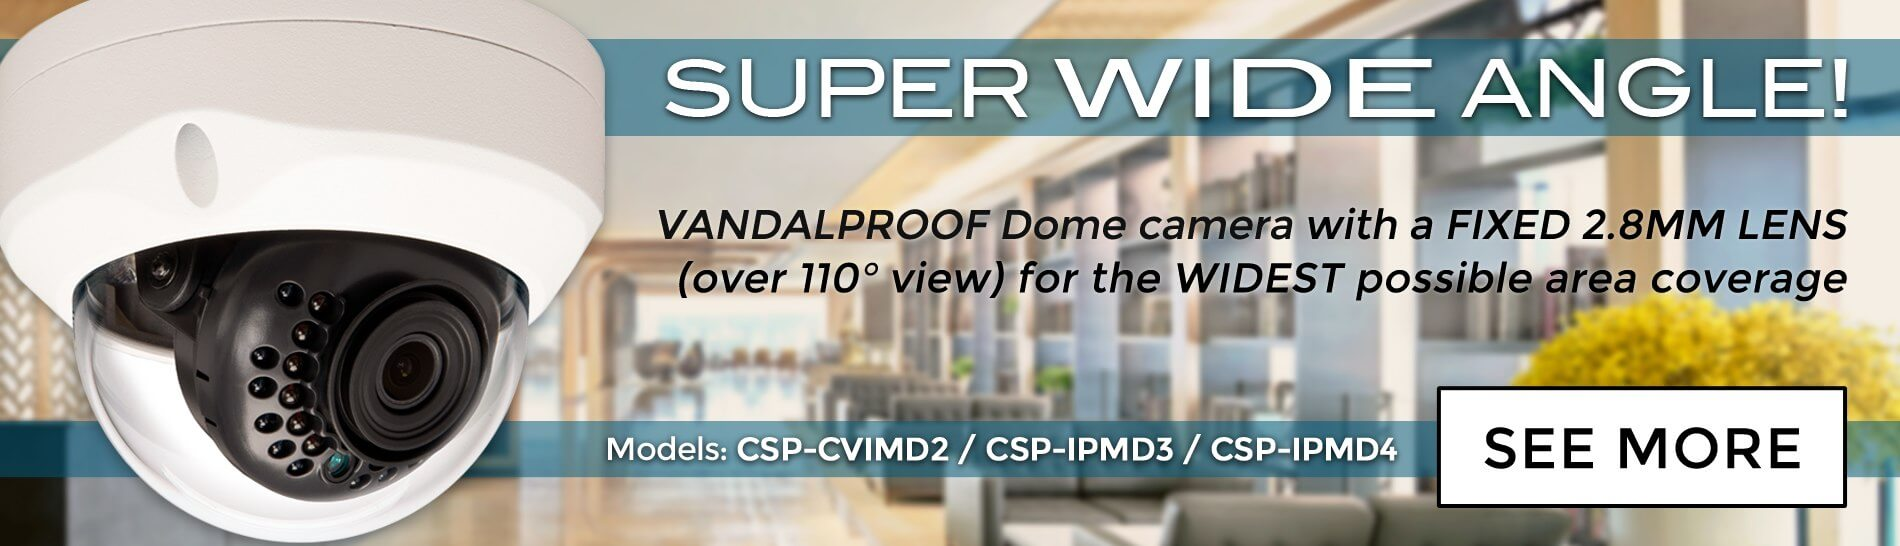 Super Wide Angle Vandalproof Dome Camera